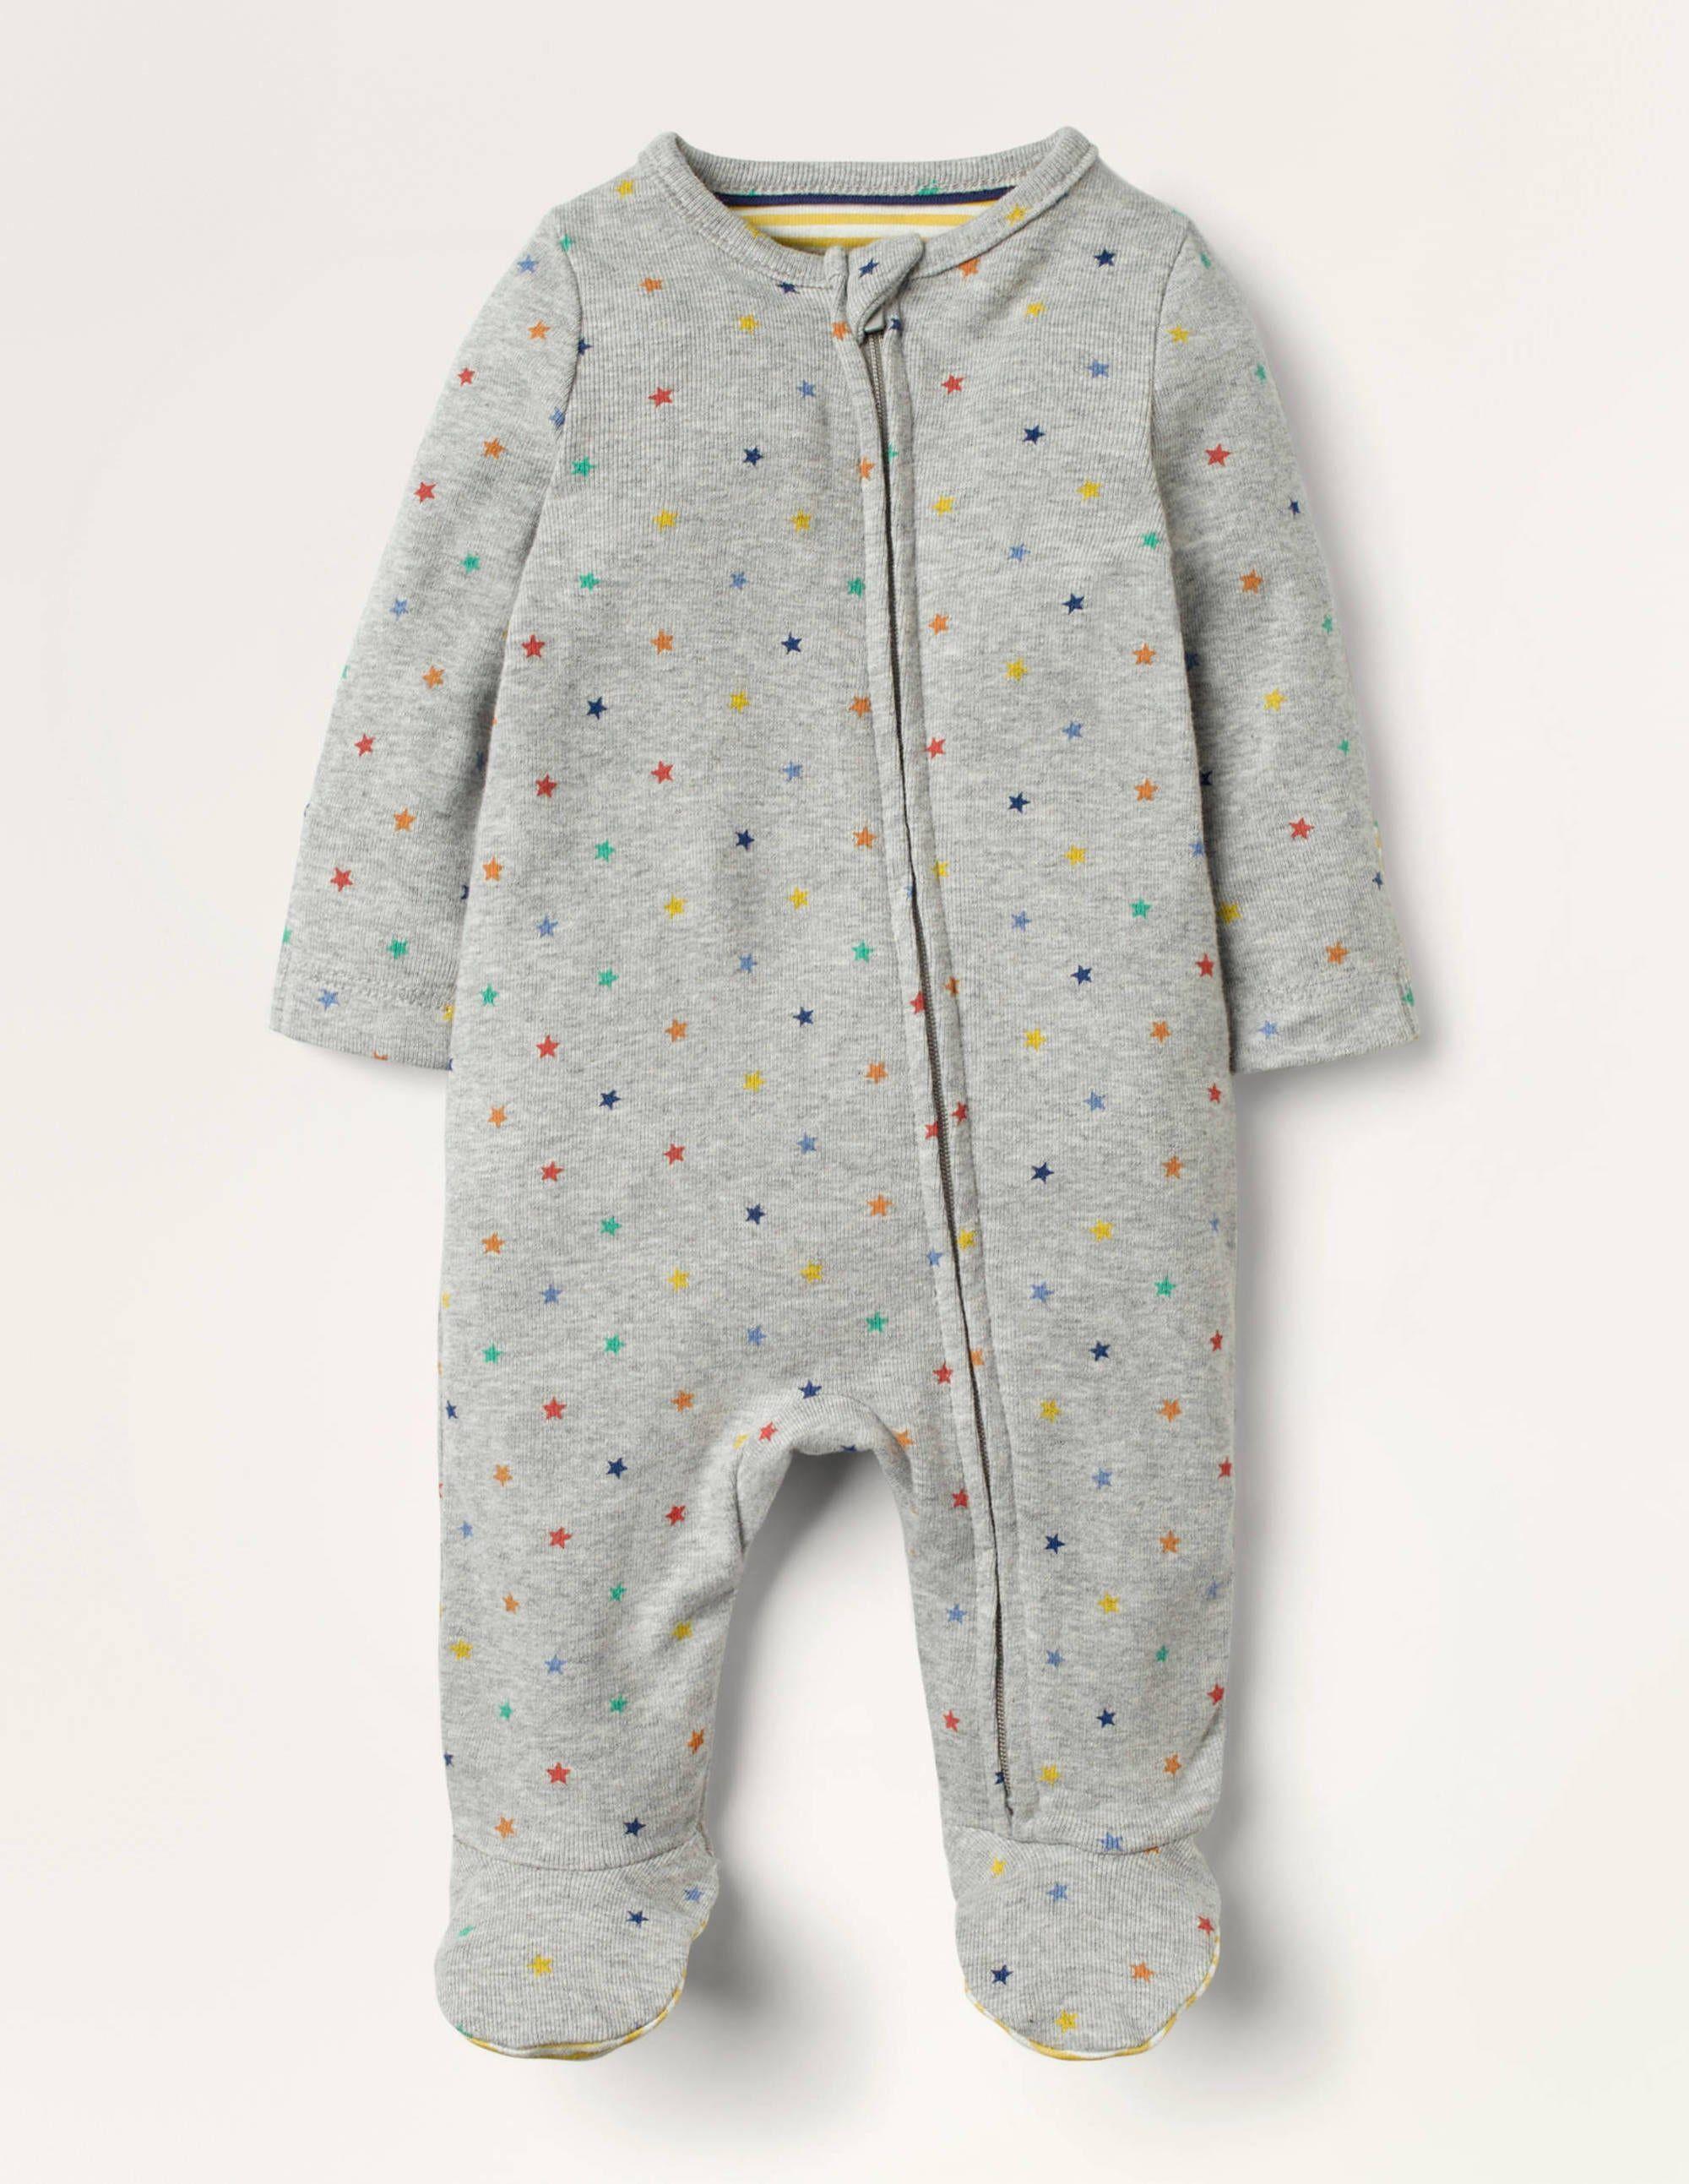 Baby Grenouillère zippée ultra-douce à motif étoile GRY Bébé Boden, Grey - 6-9m